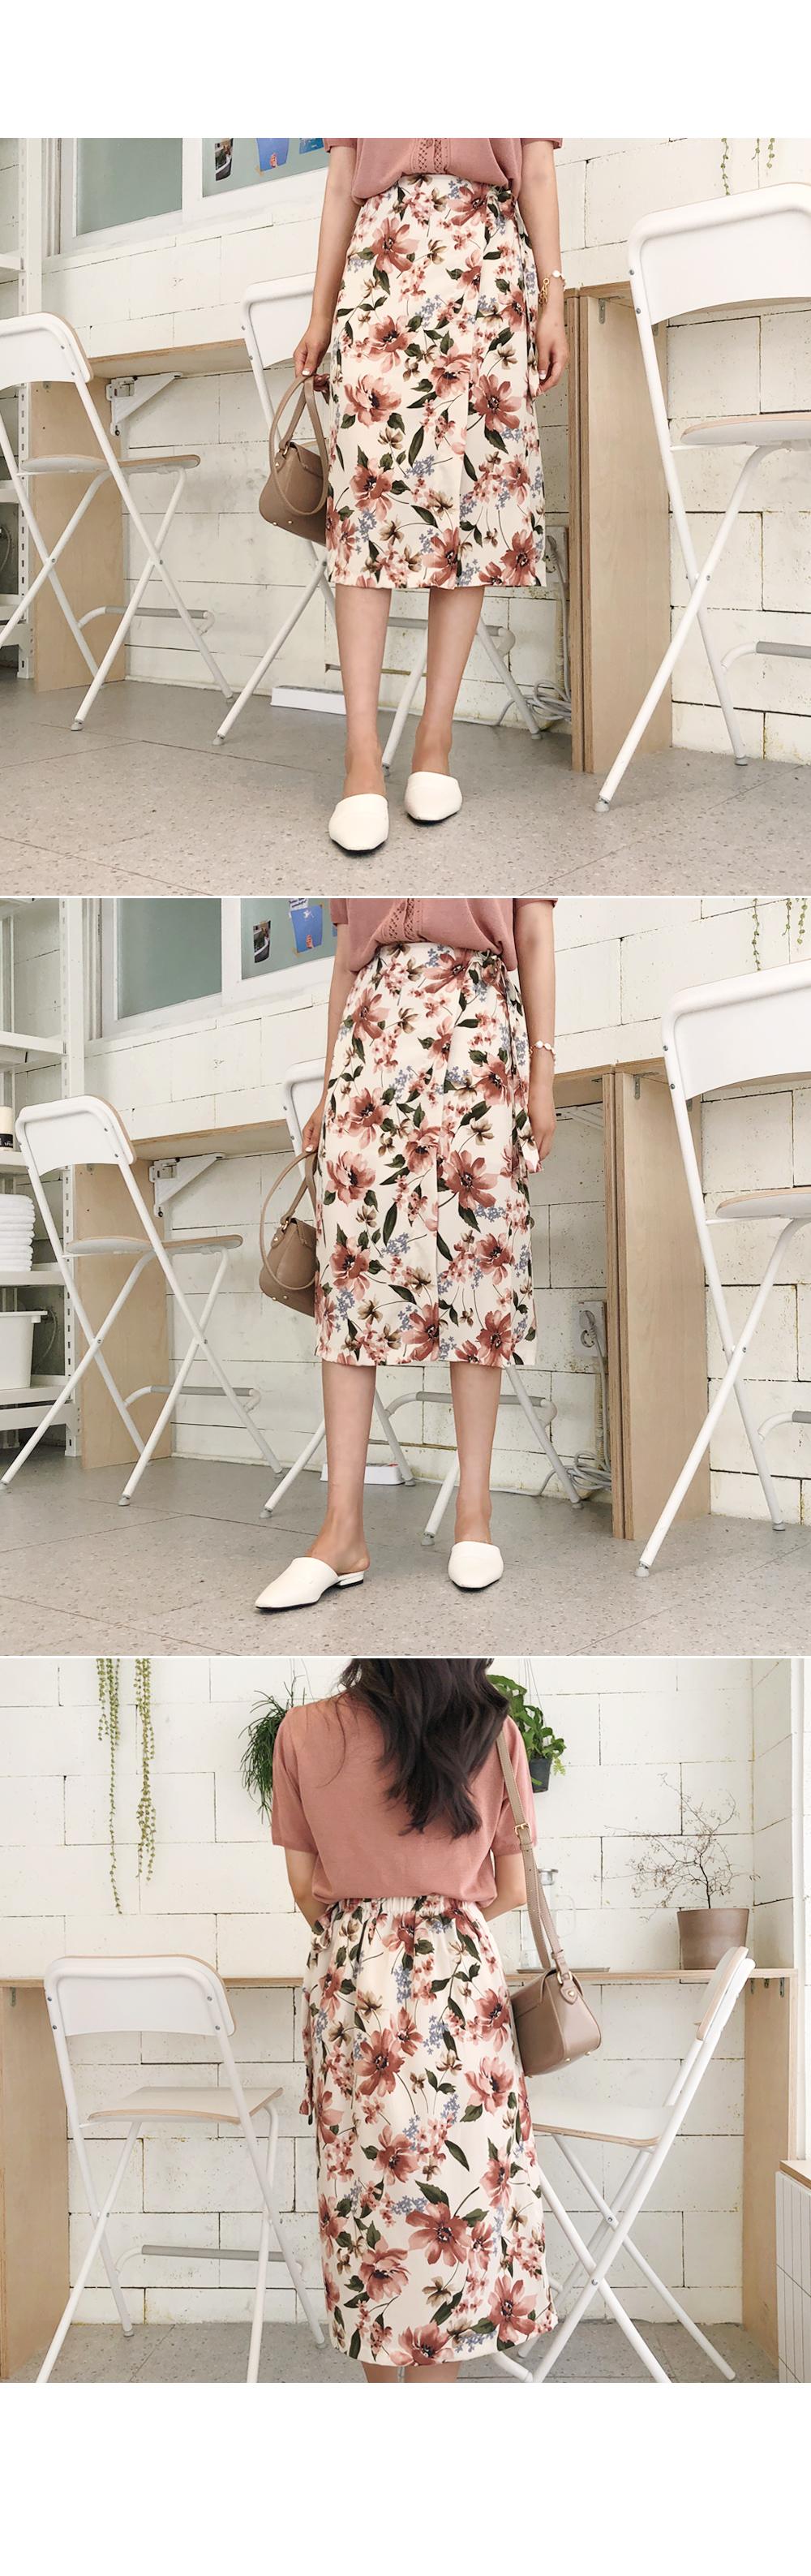 Big Flower Slit Skirt